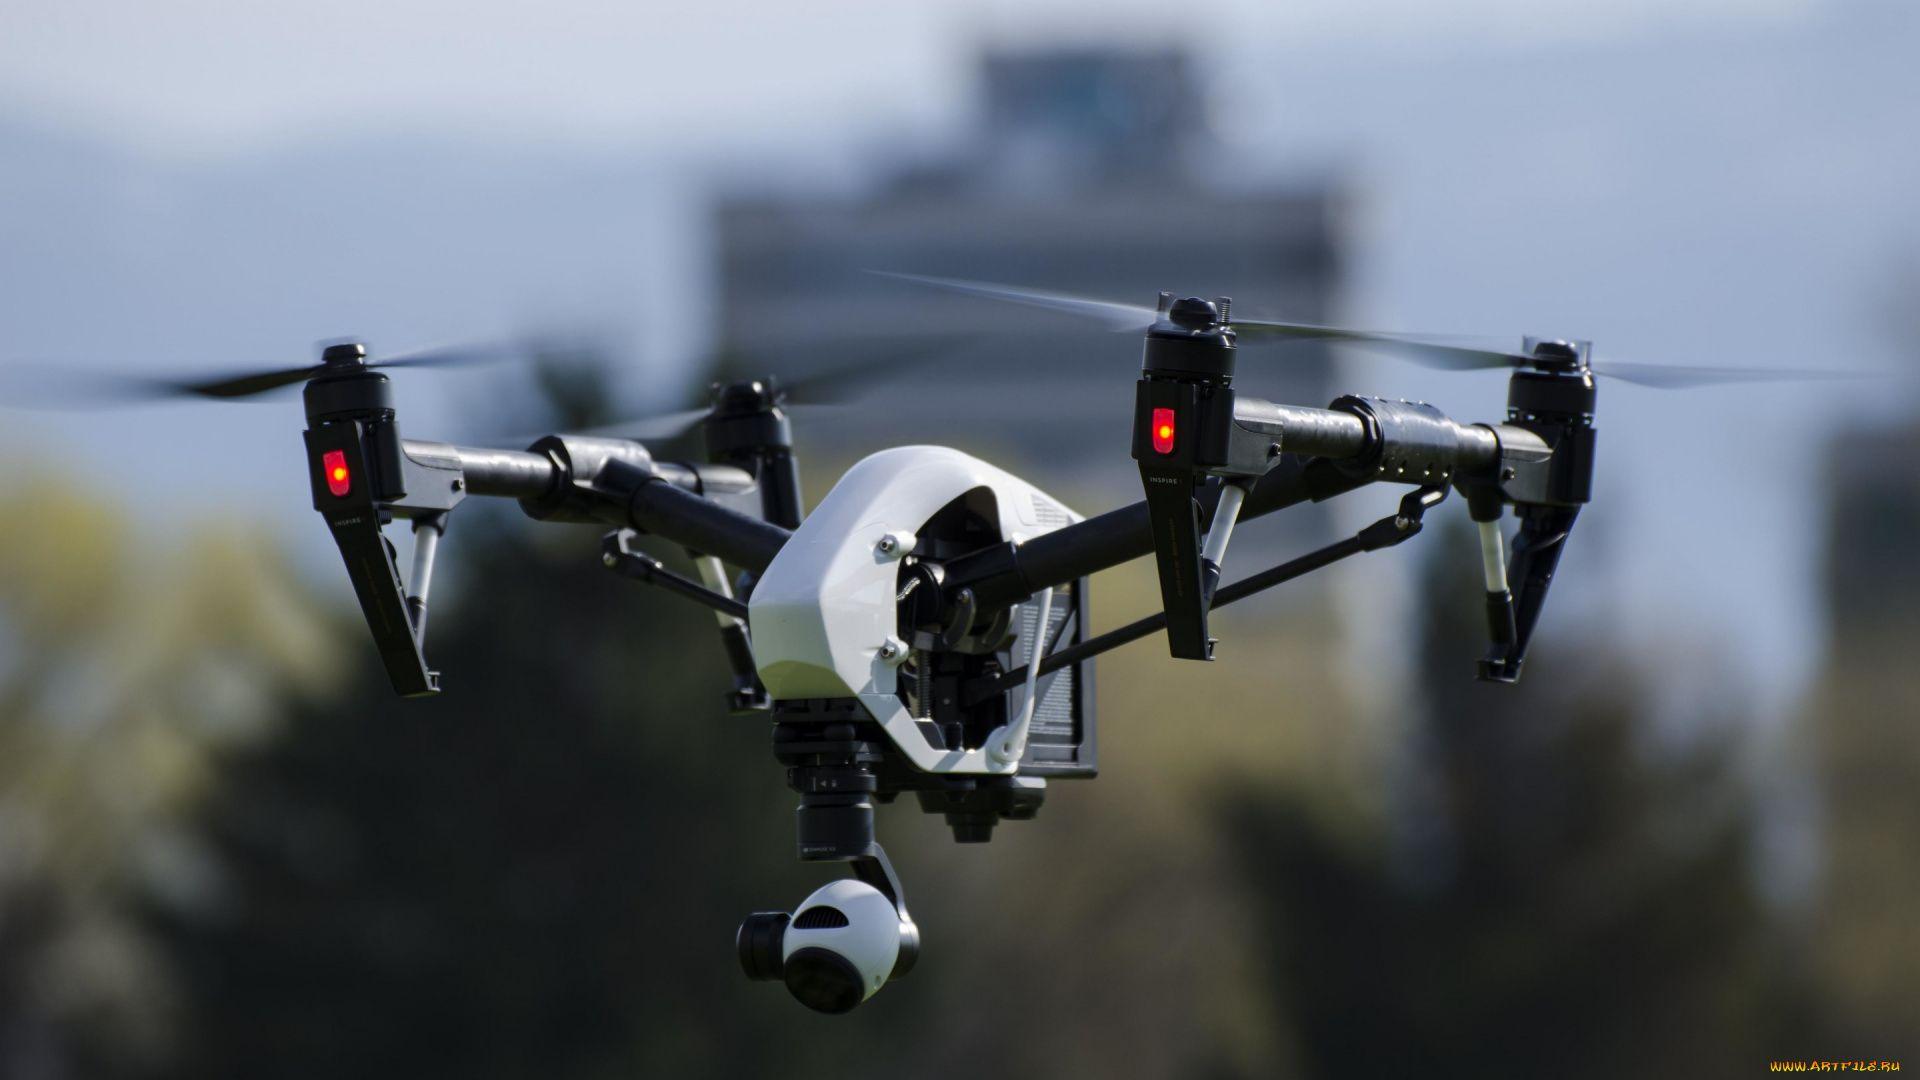 Drone screen wallpaper